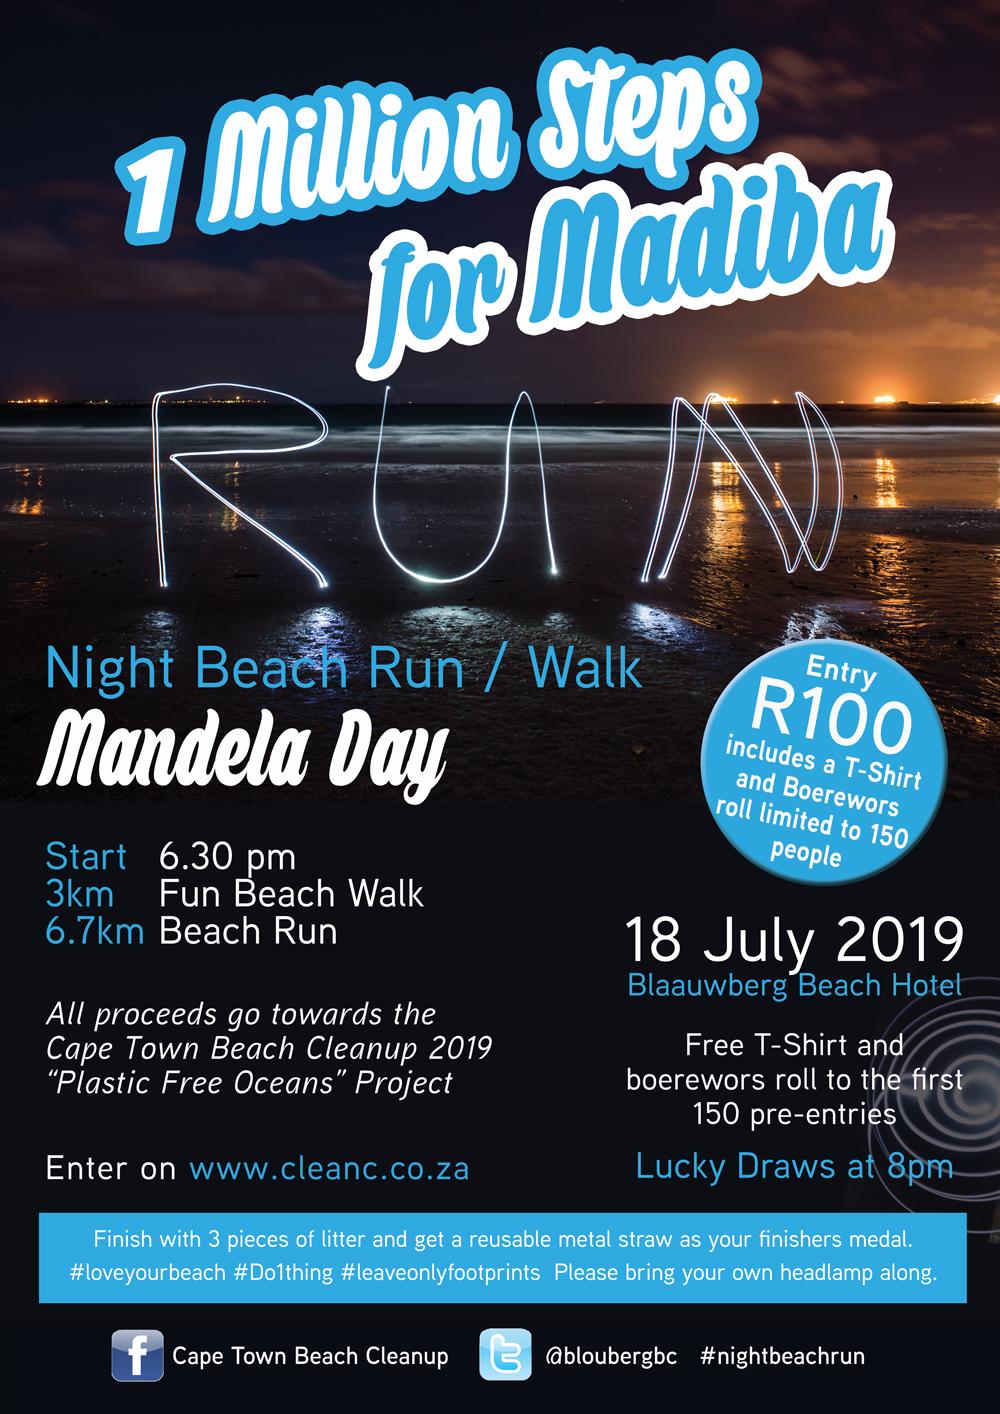 1 Million Steps for Madiba Beach Walk 18 July